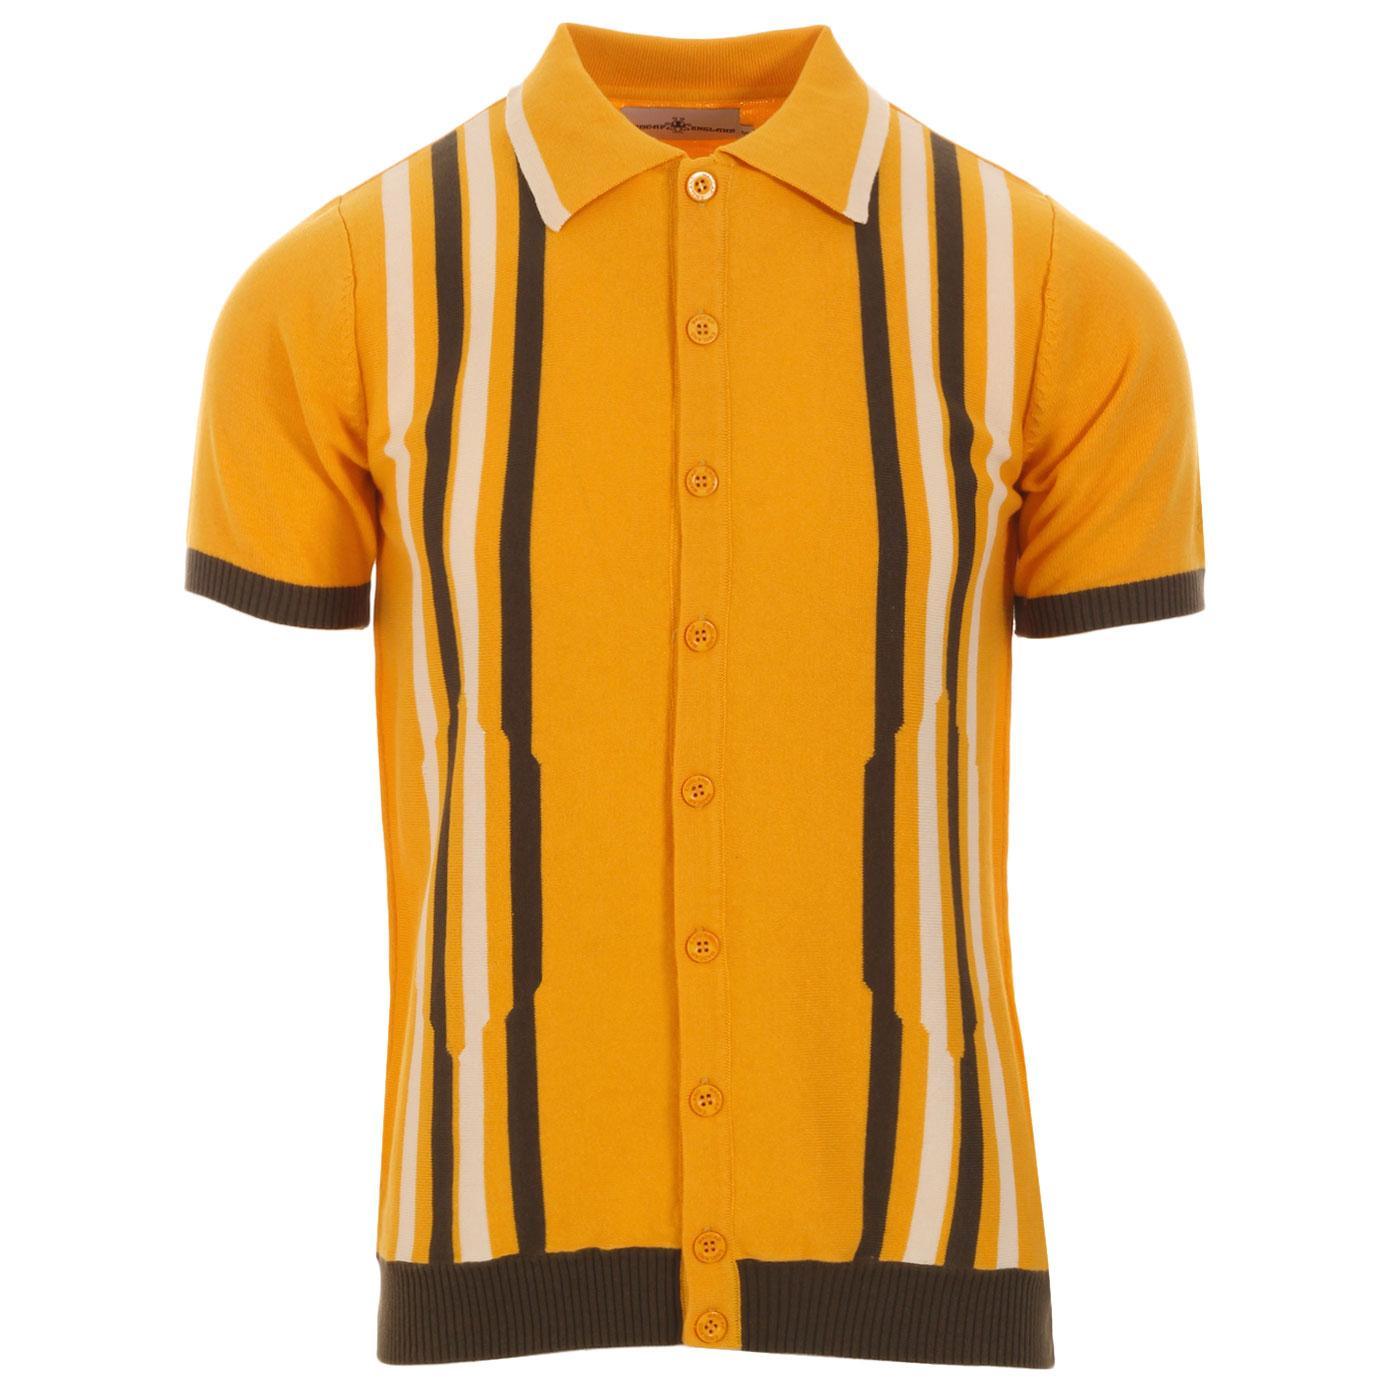 Shockwave MADCAP ENGLAND Mod Stripe Knit Polo (AY)